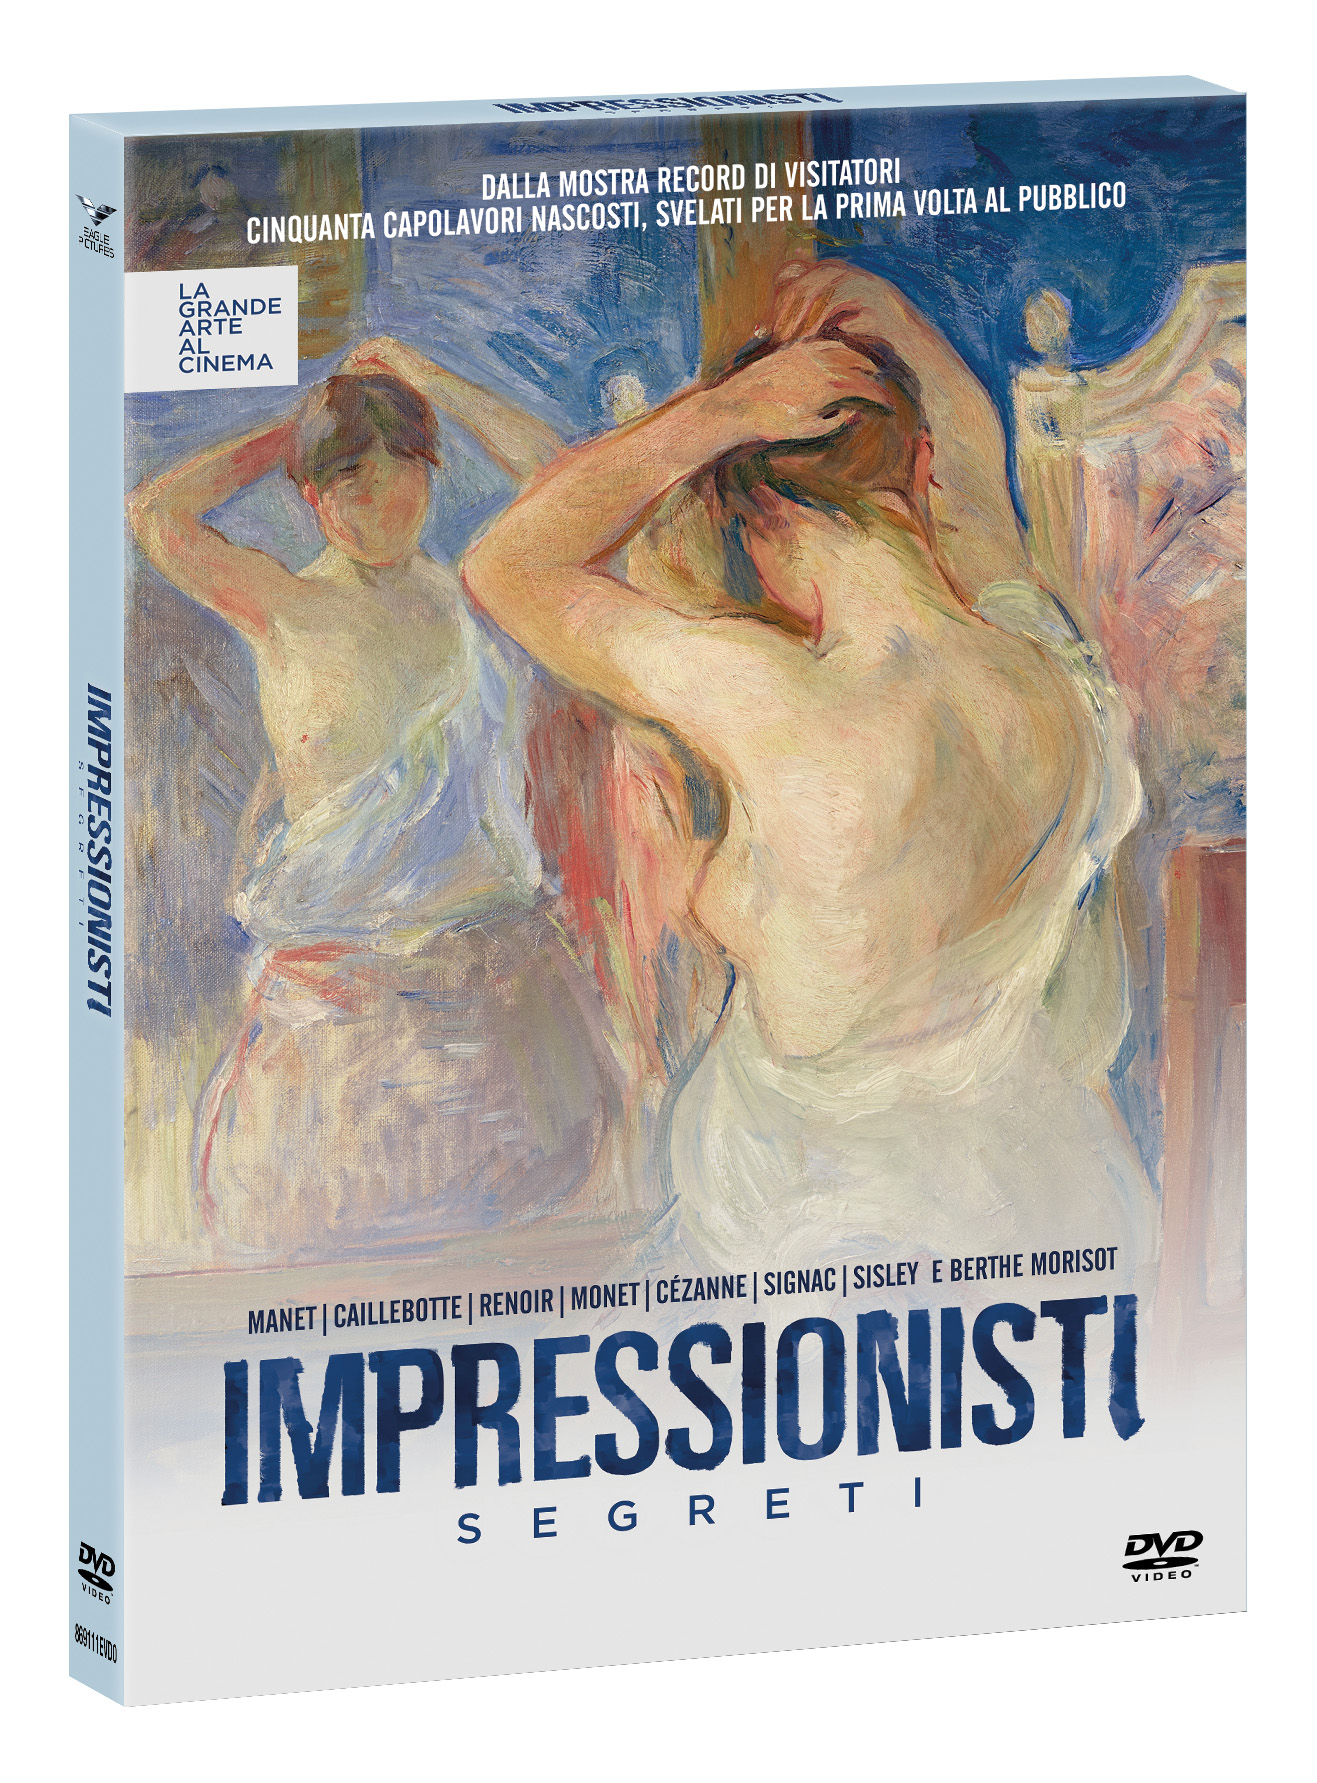 IMPRESSIONISTI SEGRETI (DVD)